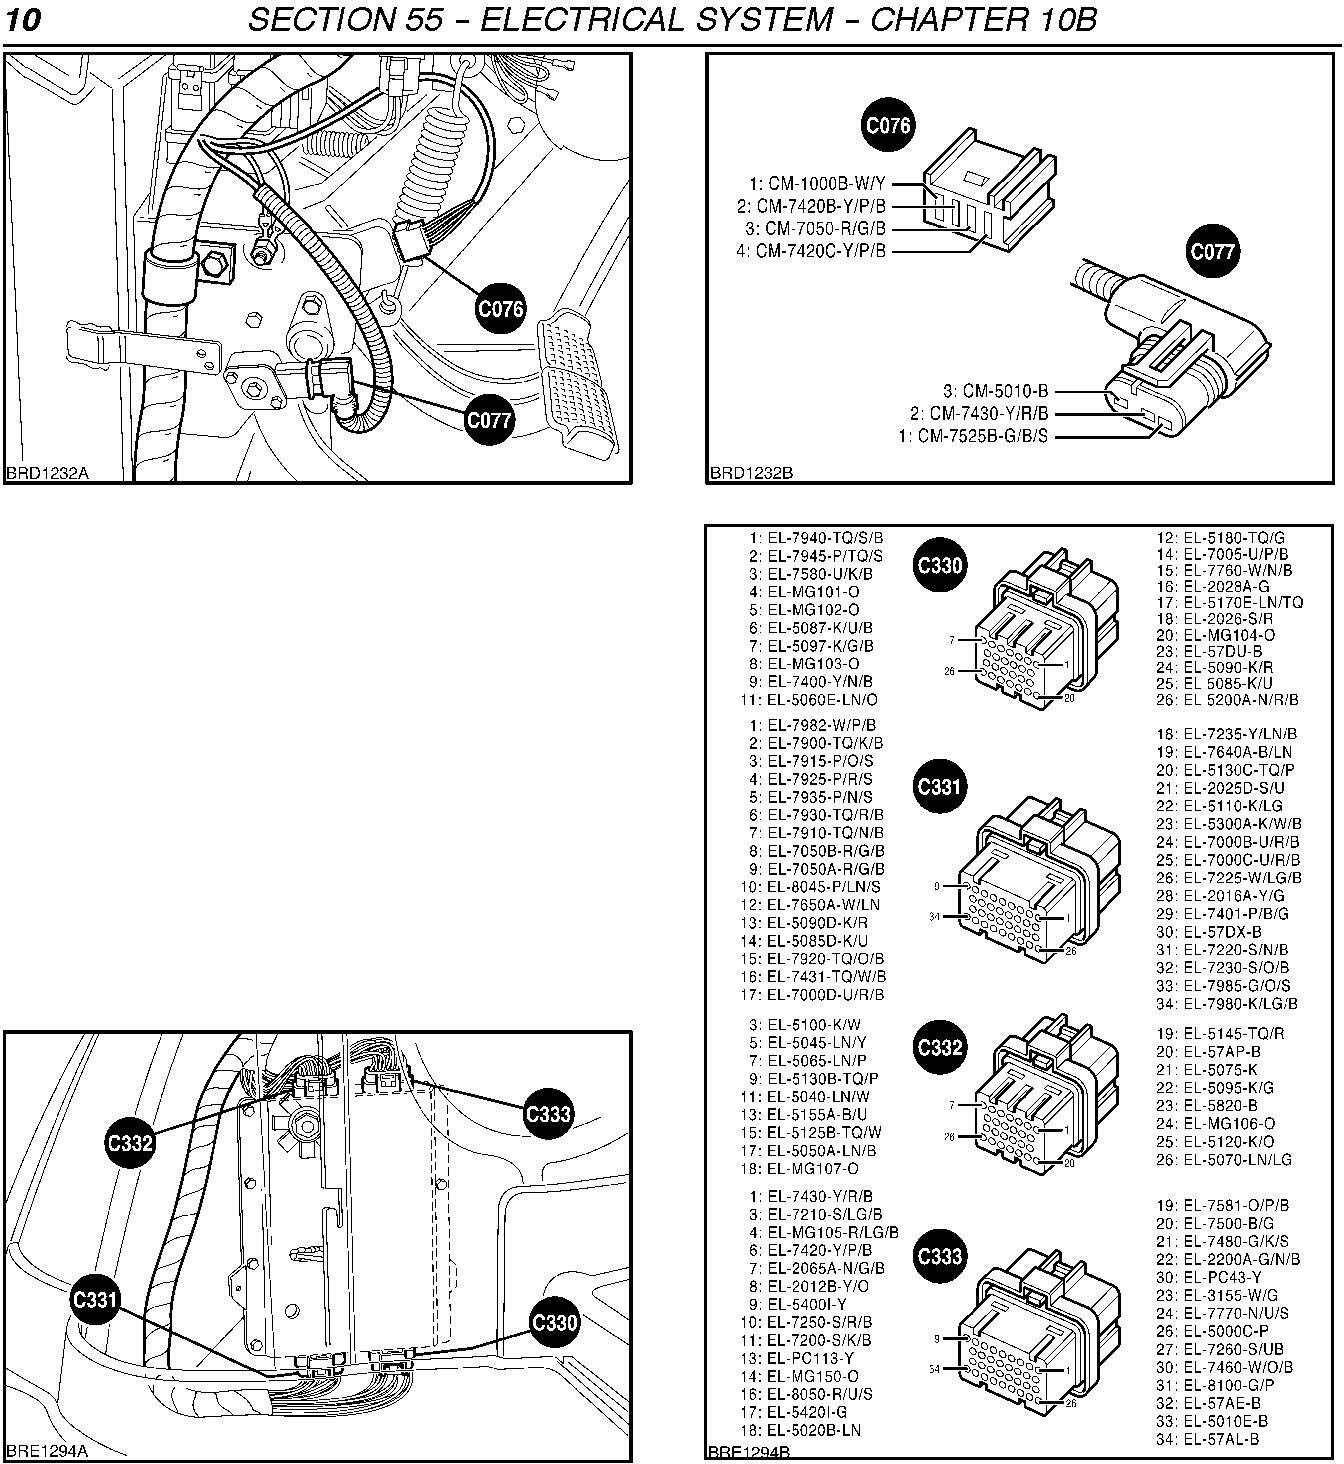 new holland tm120 125 130 140 150 155 tm175 tm190 tractor fault codes diagnostic service manual truck service manual store